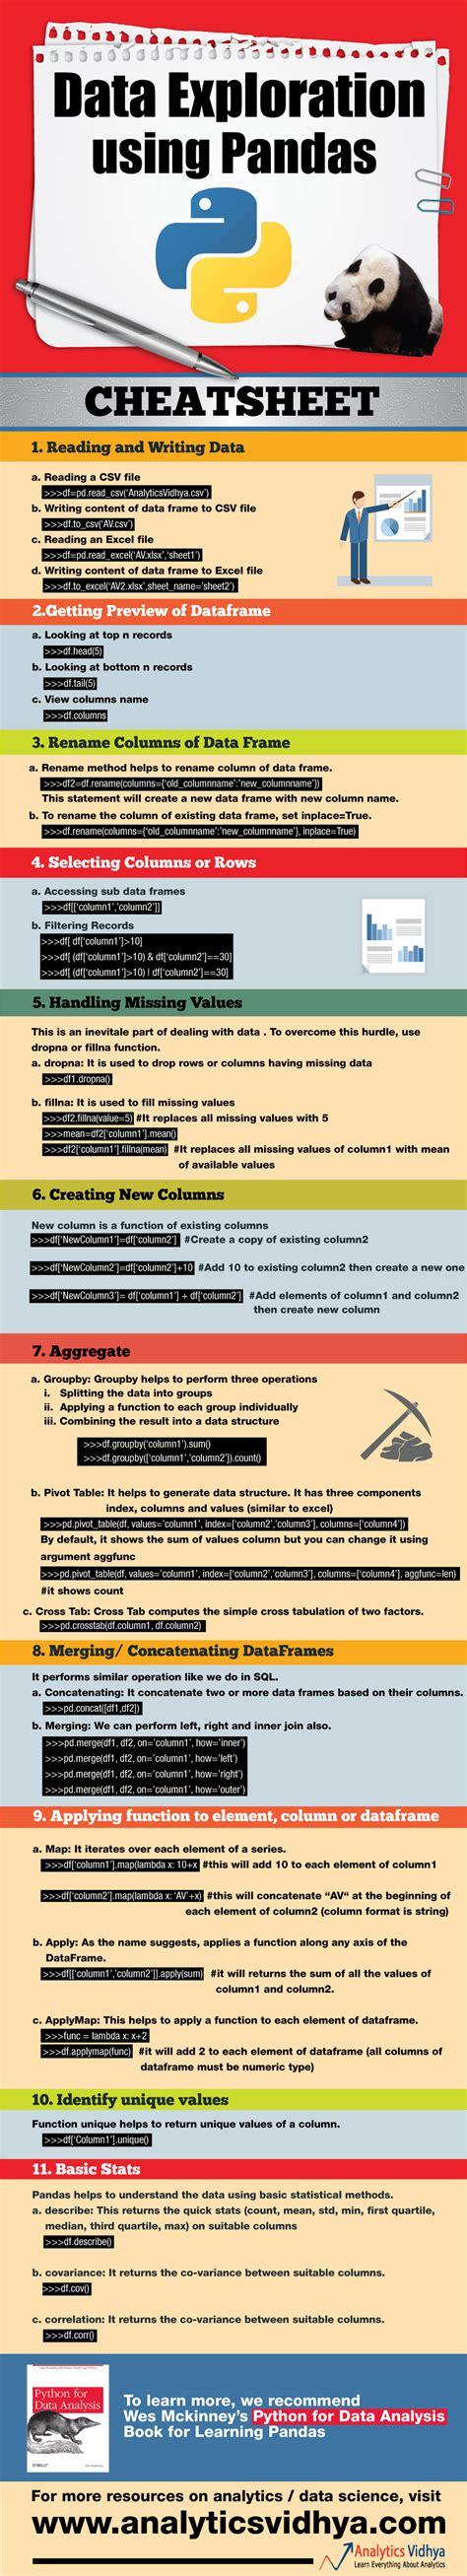 python pandas data exploration cheat using sheet cheatsheet pdf infographic sheets analysis science programming analyticsvidhya computer bicorner learn scikit common